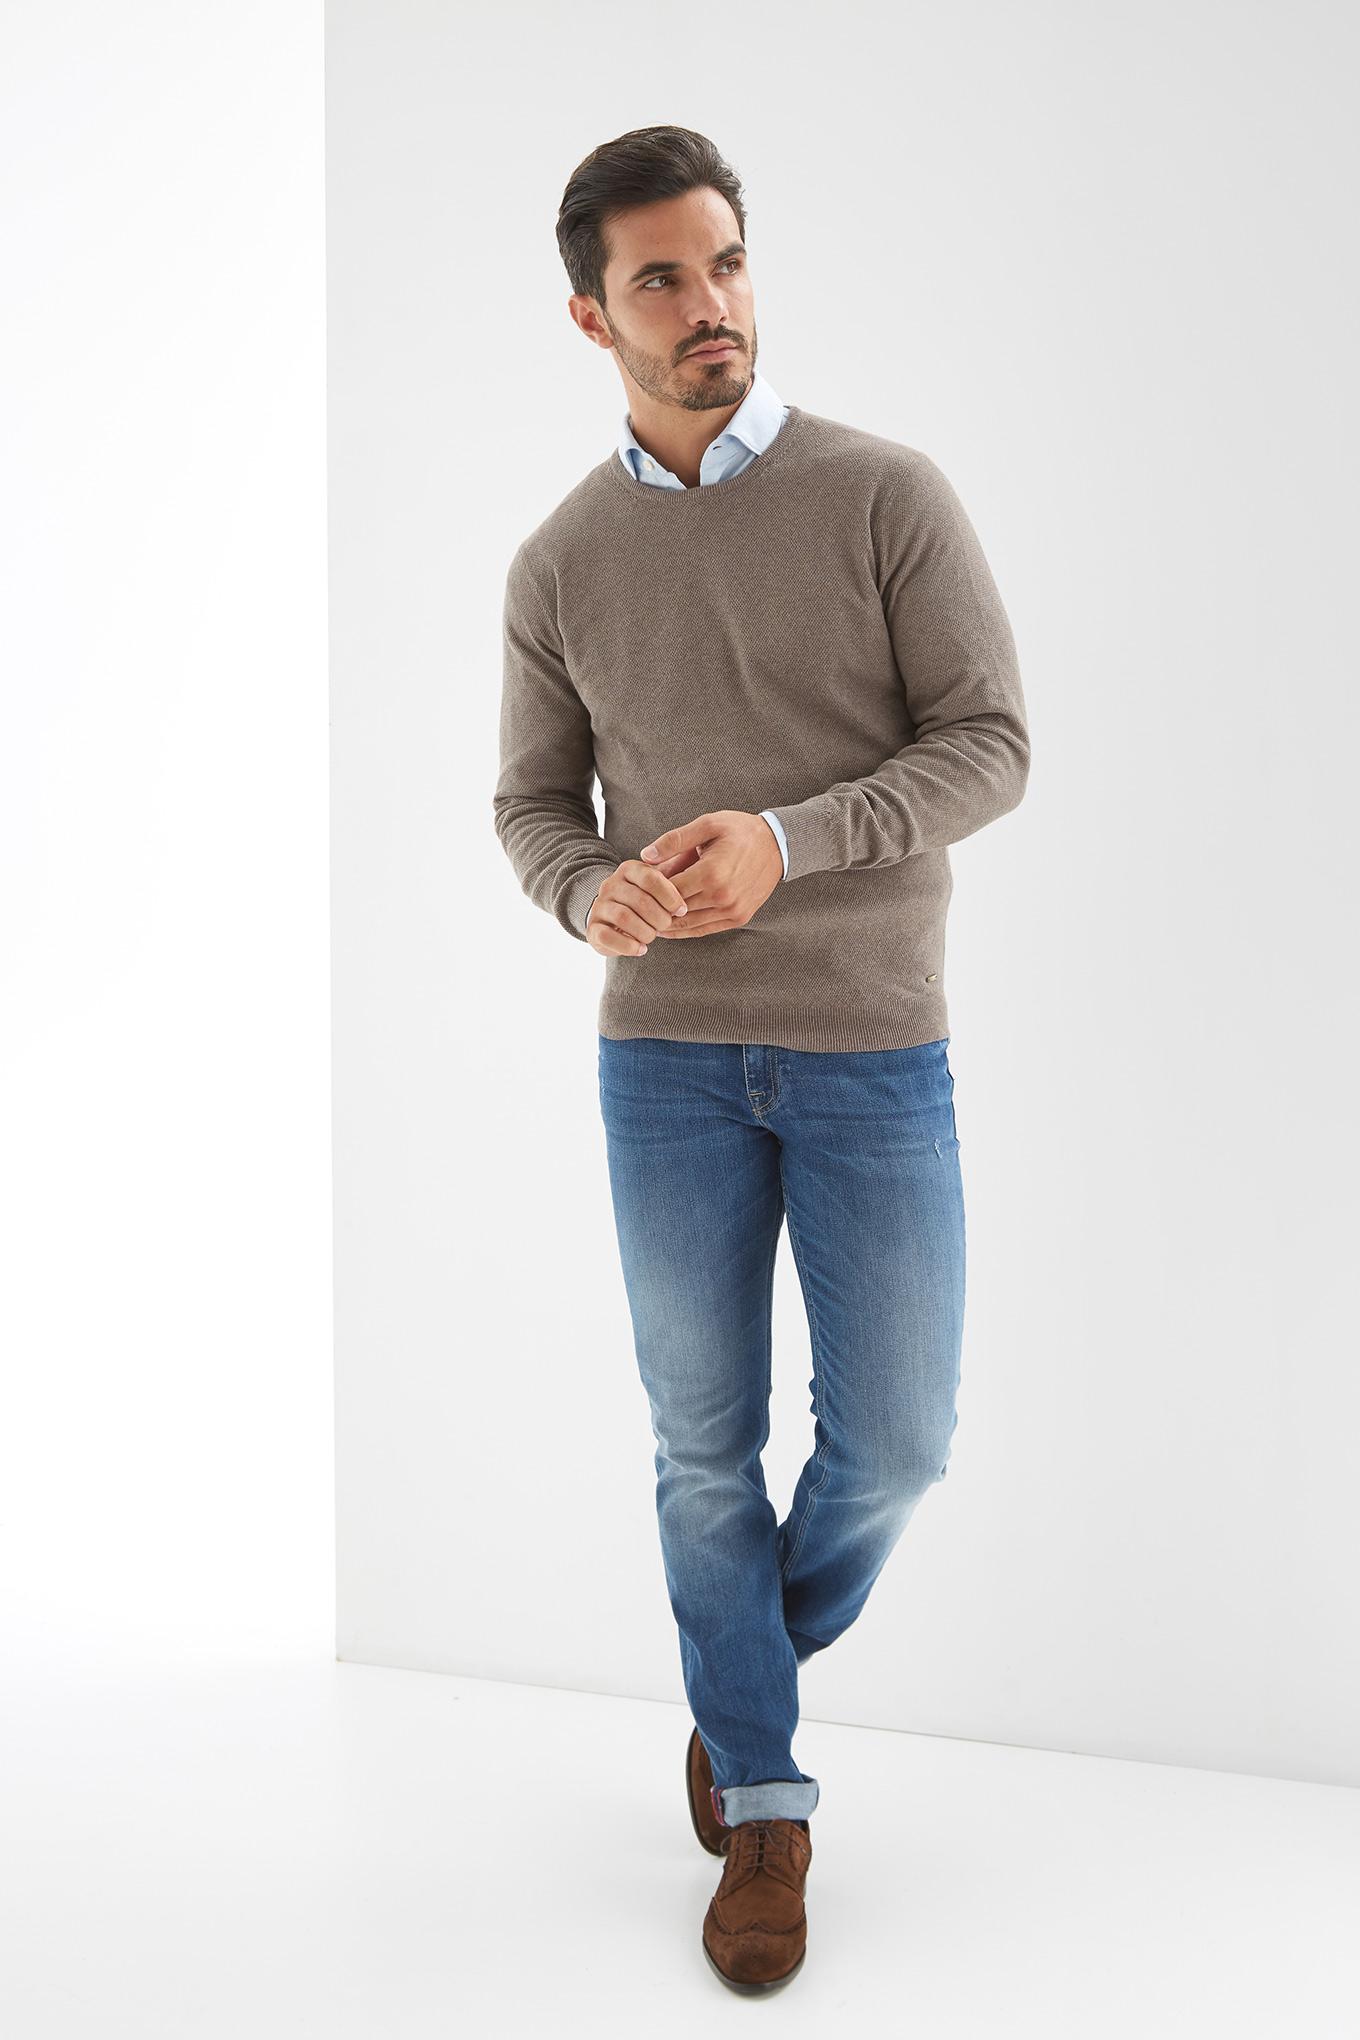 Sweater Dark Beige Casual Man